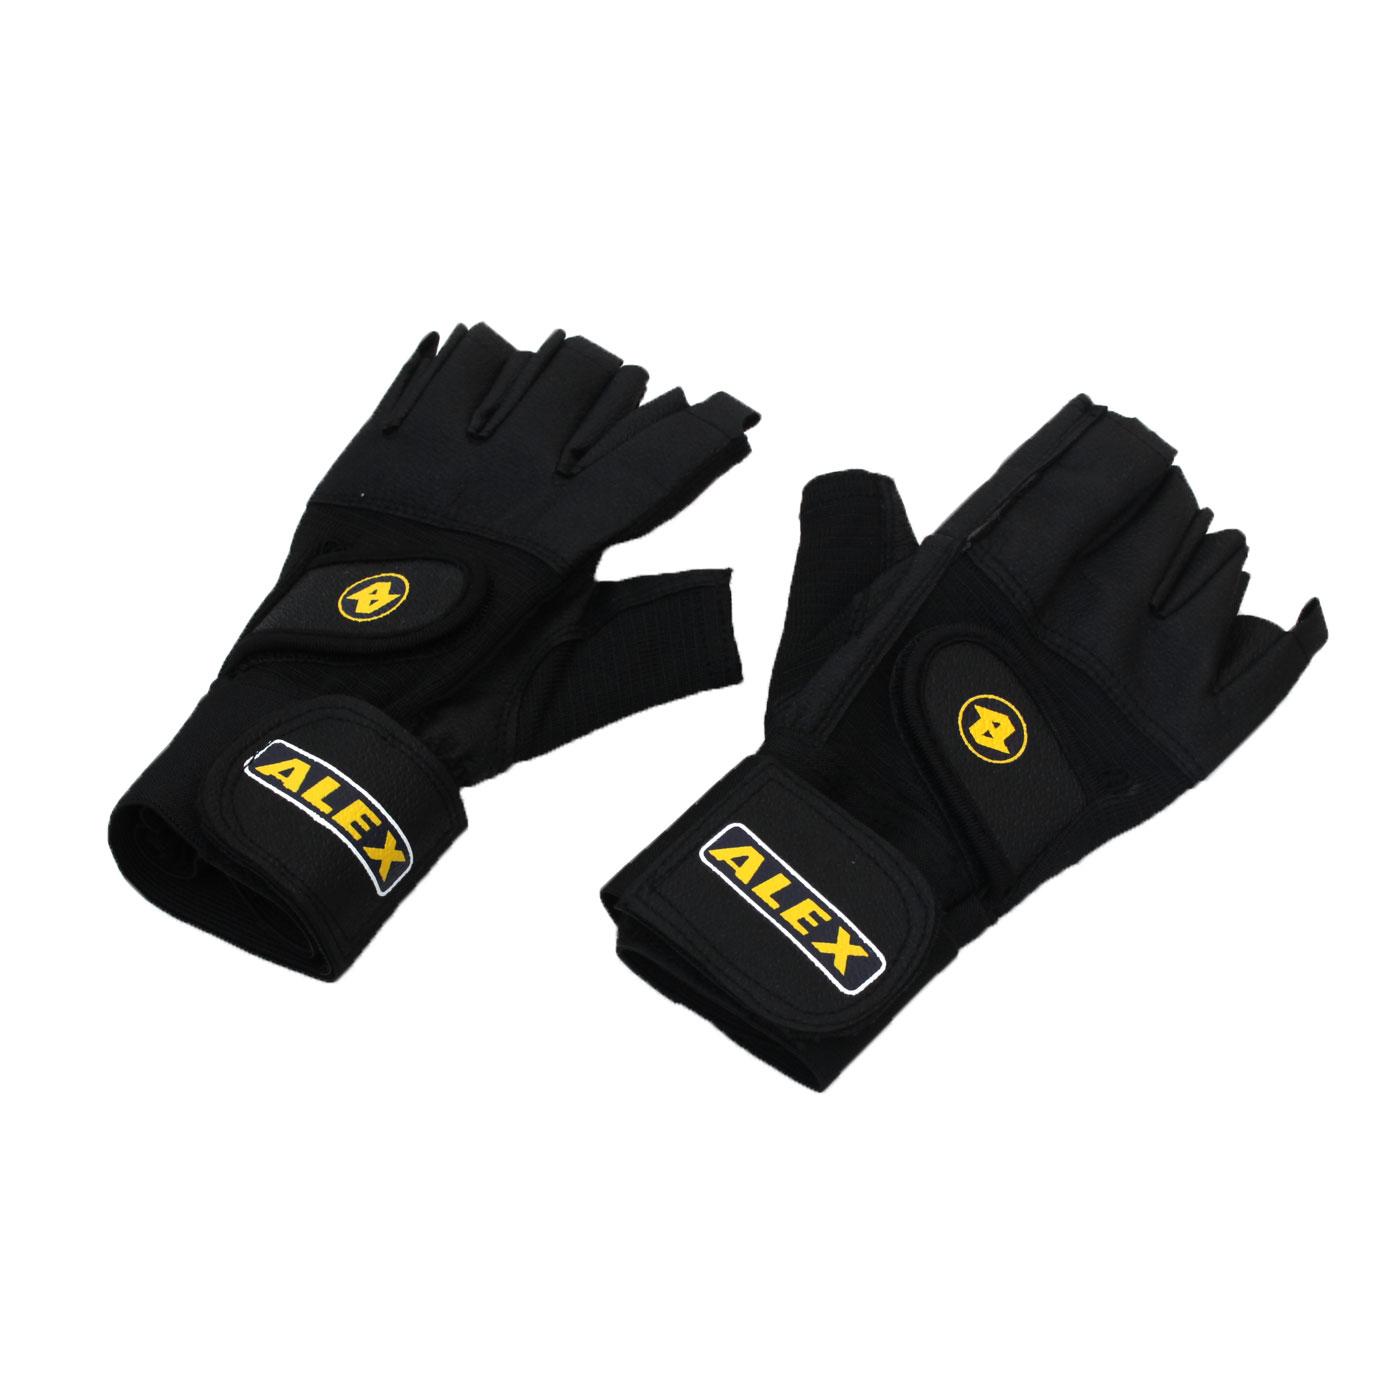 ALEX 皮革手套 A-18 - 黑